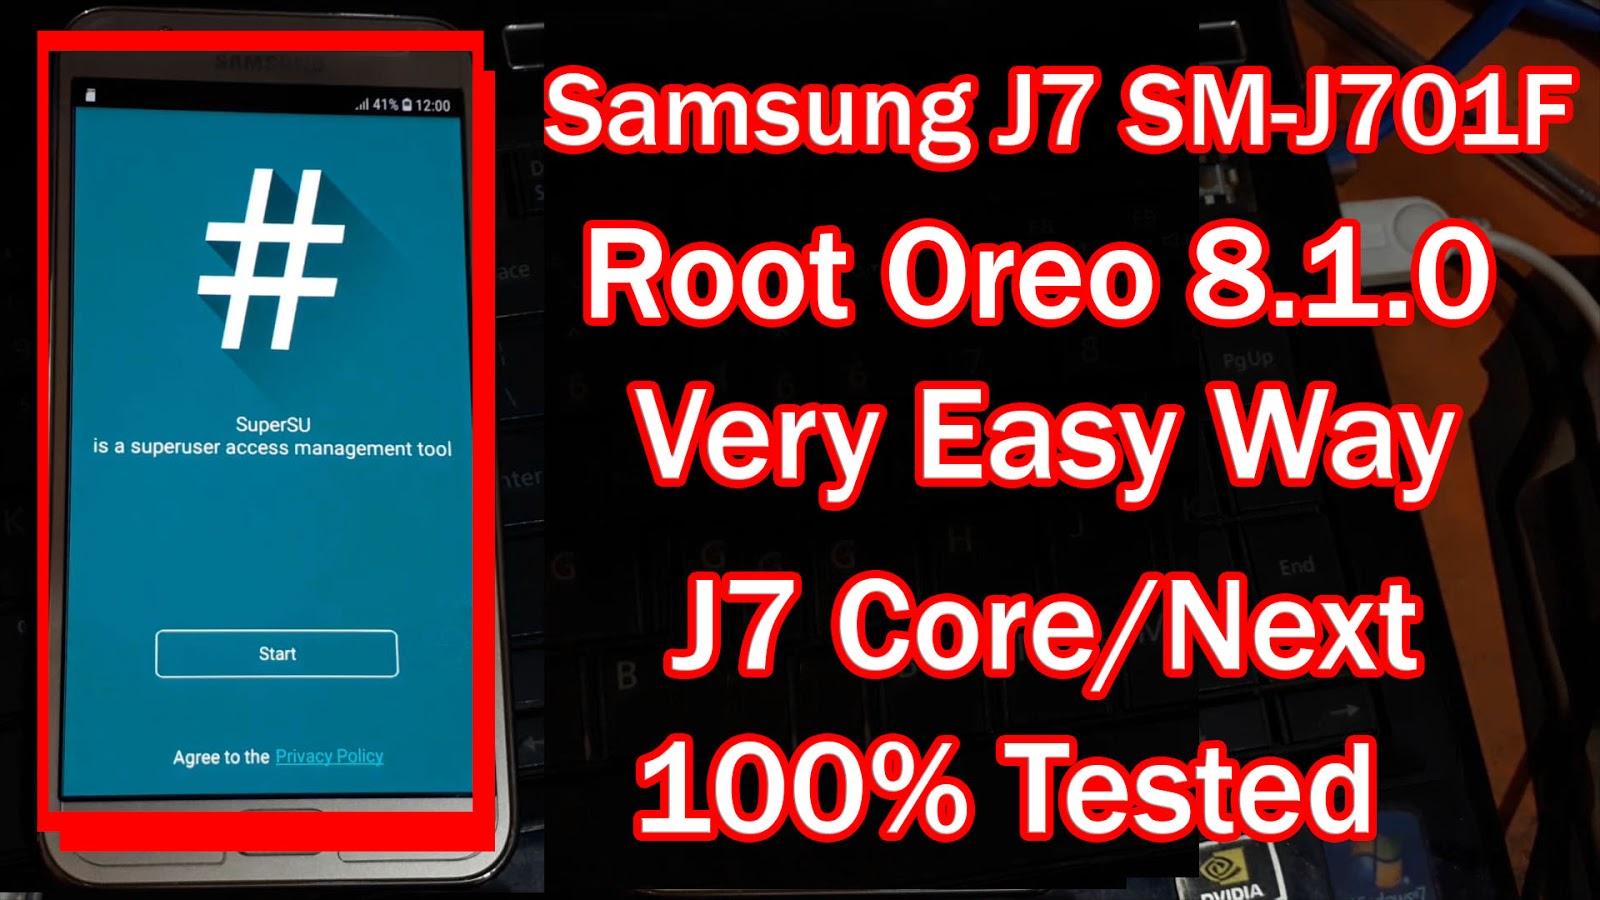 Samsung Galaxy J7 Core/Next (SM-J701F) Oreo8 1 0 Root File